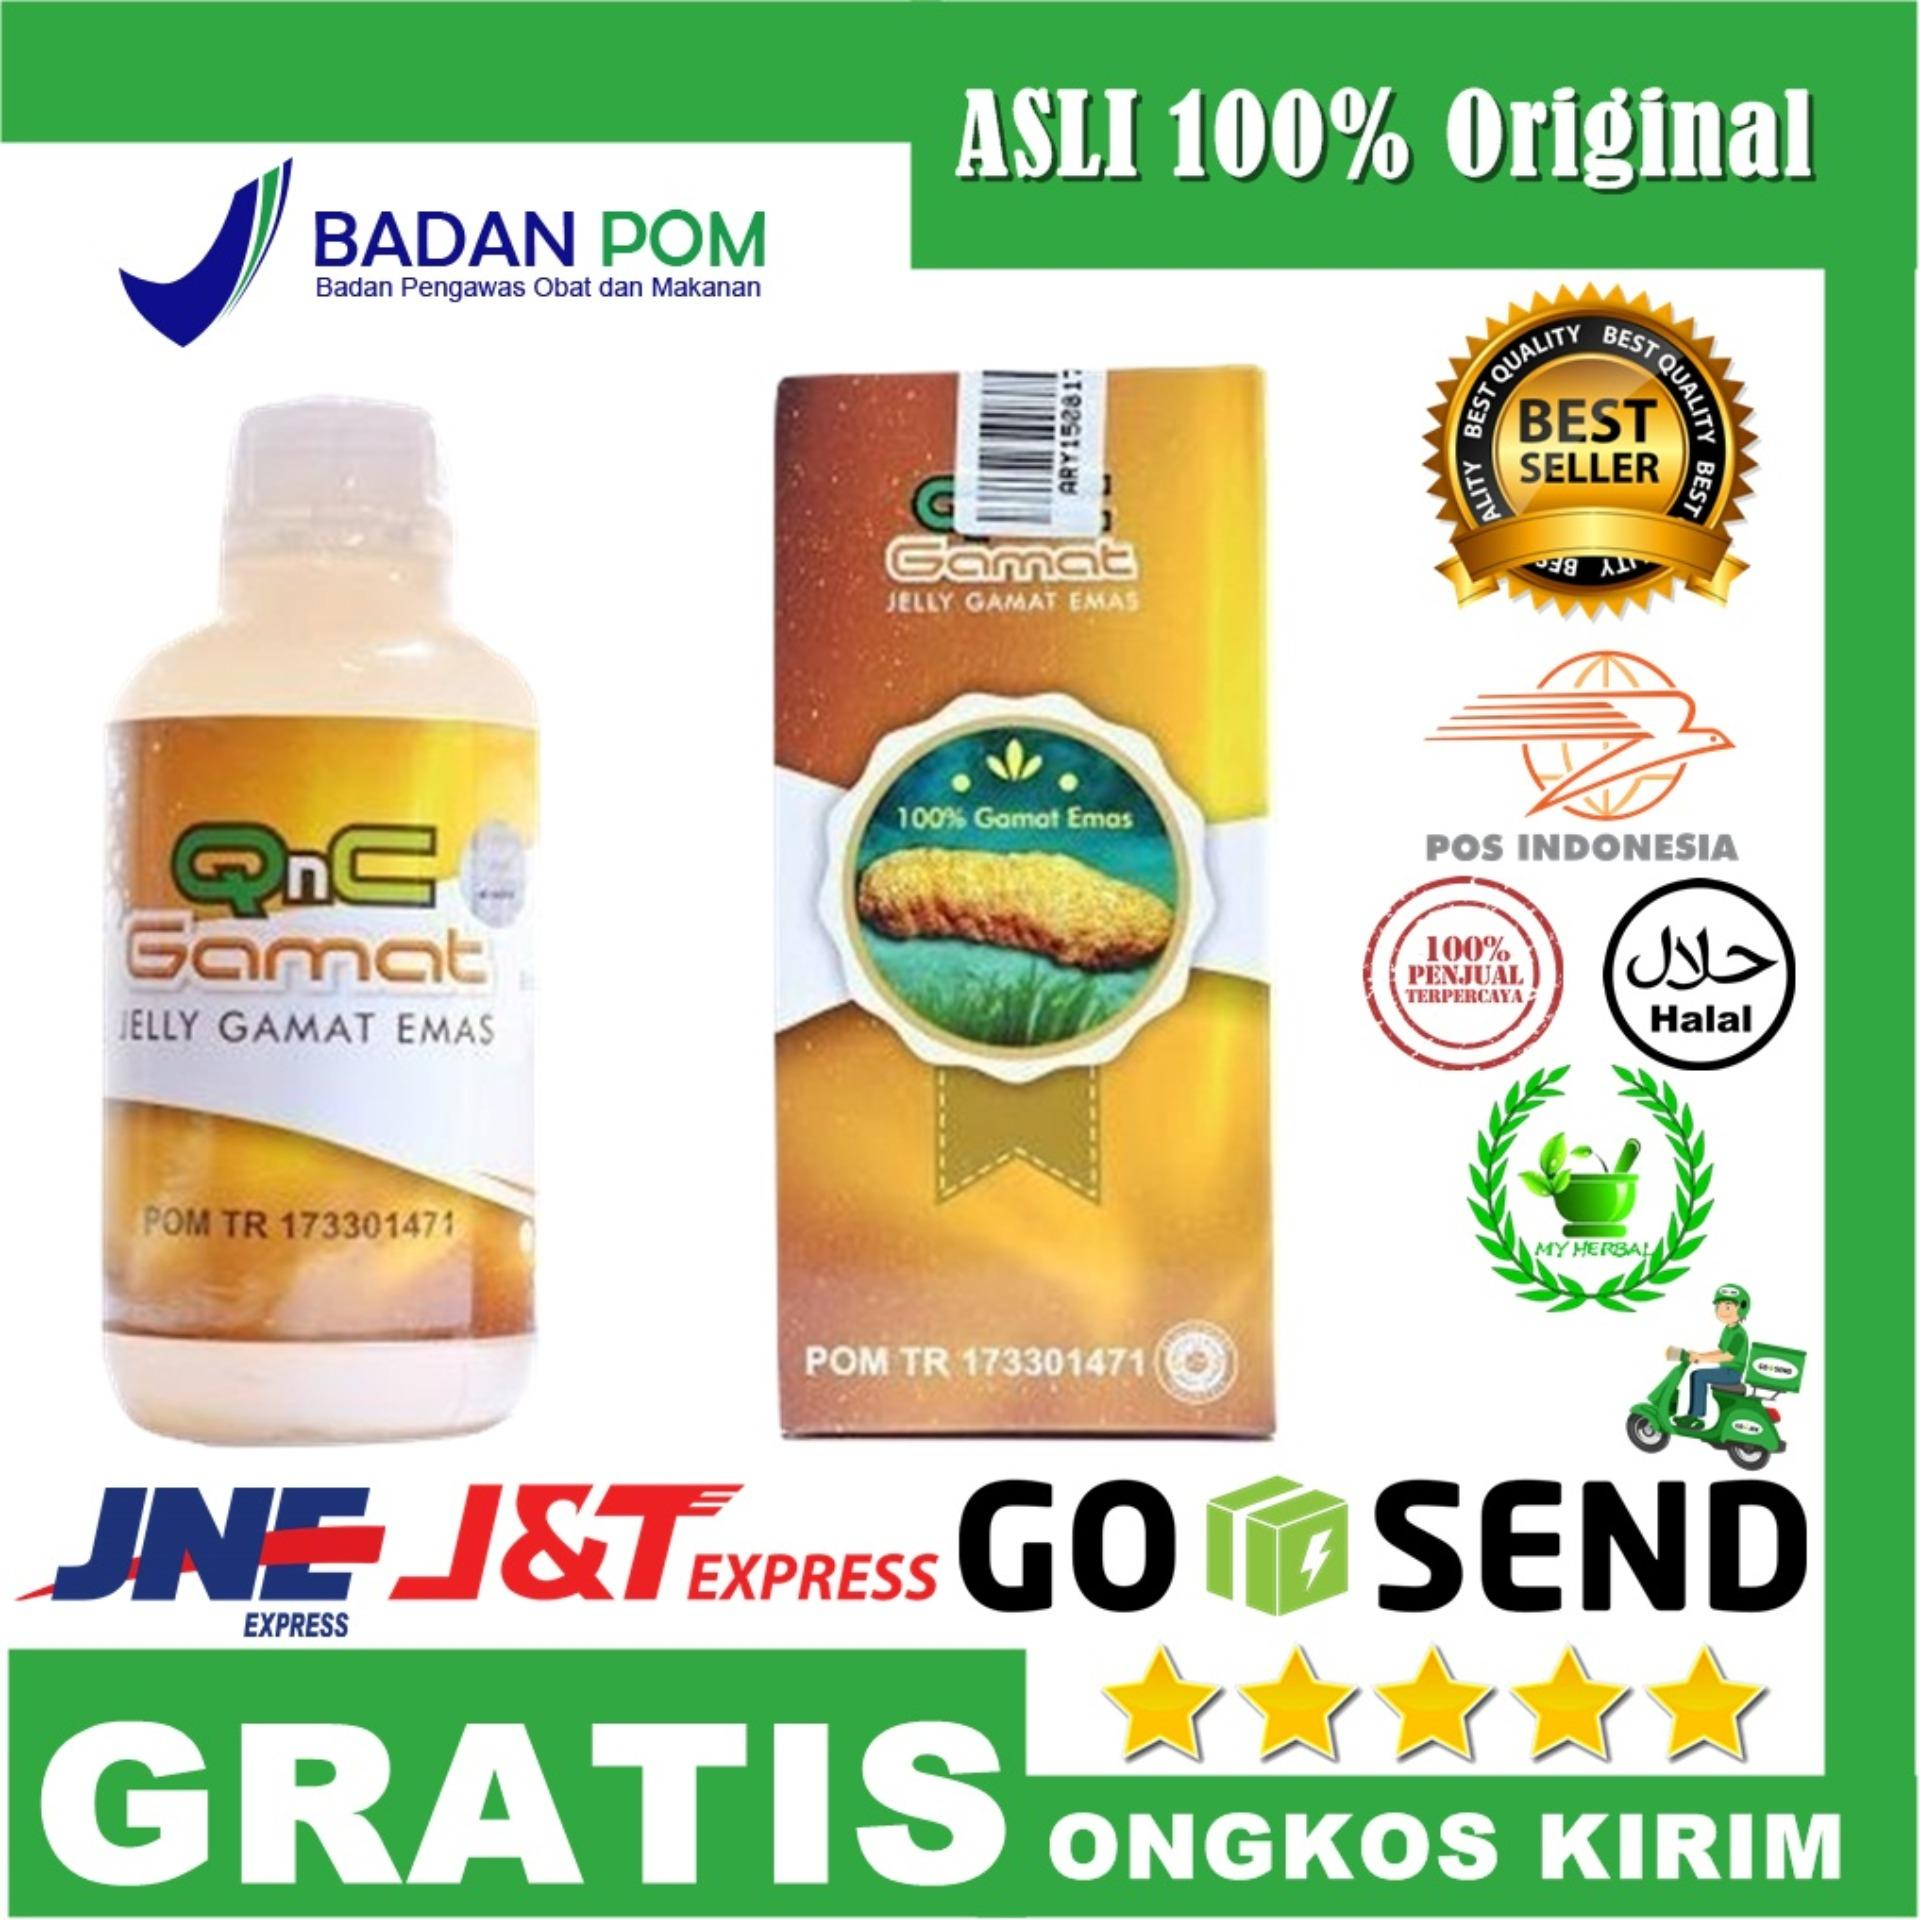 QnC Jelly Gamat di Medan, QnC Jelly Gamat di Jakarta, QnC Jelly Gamat Ada di Surabaya, QnC Jelly Gamat di Makassar, QnC Jelly Gamat di Semarang, QnC Jelly Gamat di Palembang, QnC Jelly Gamat di Pekanbaru, QnC Jelly Gamat di Malang, di Padang DLL